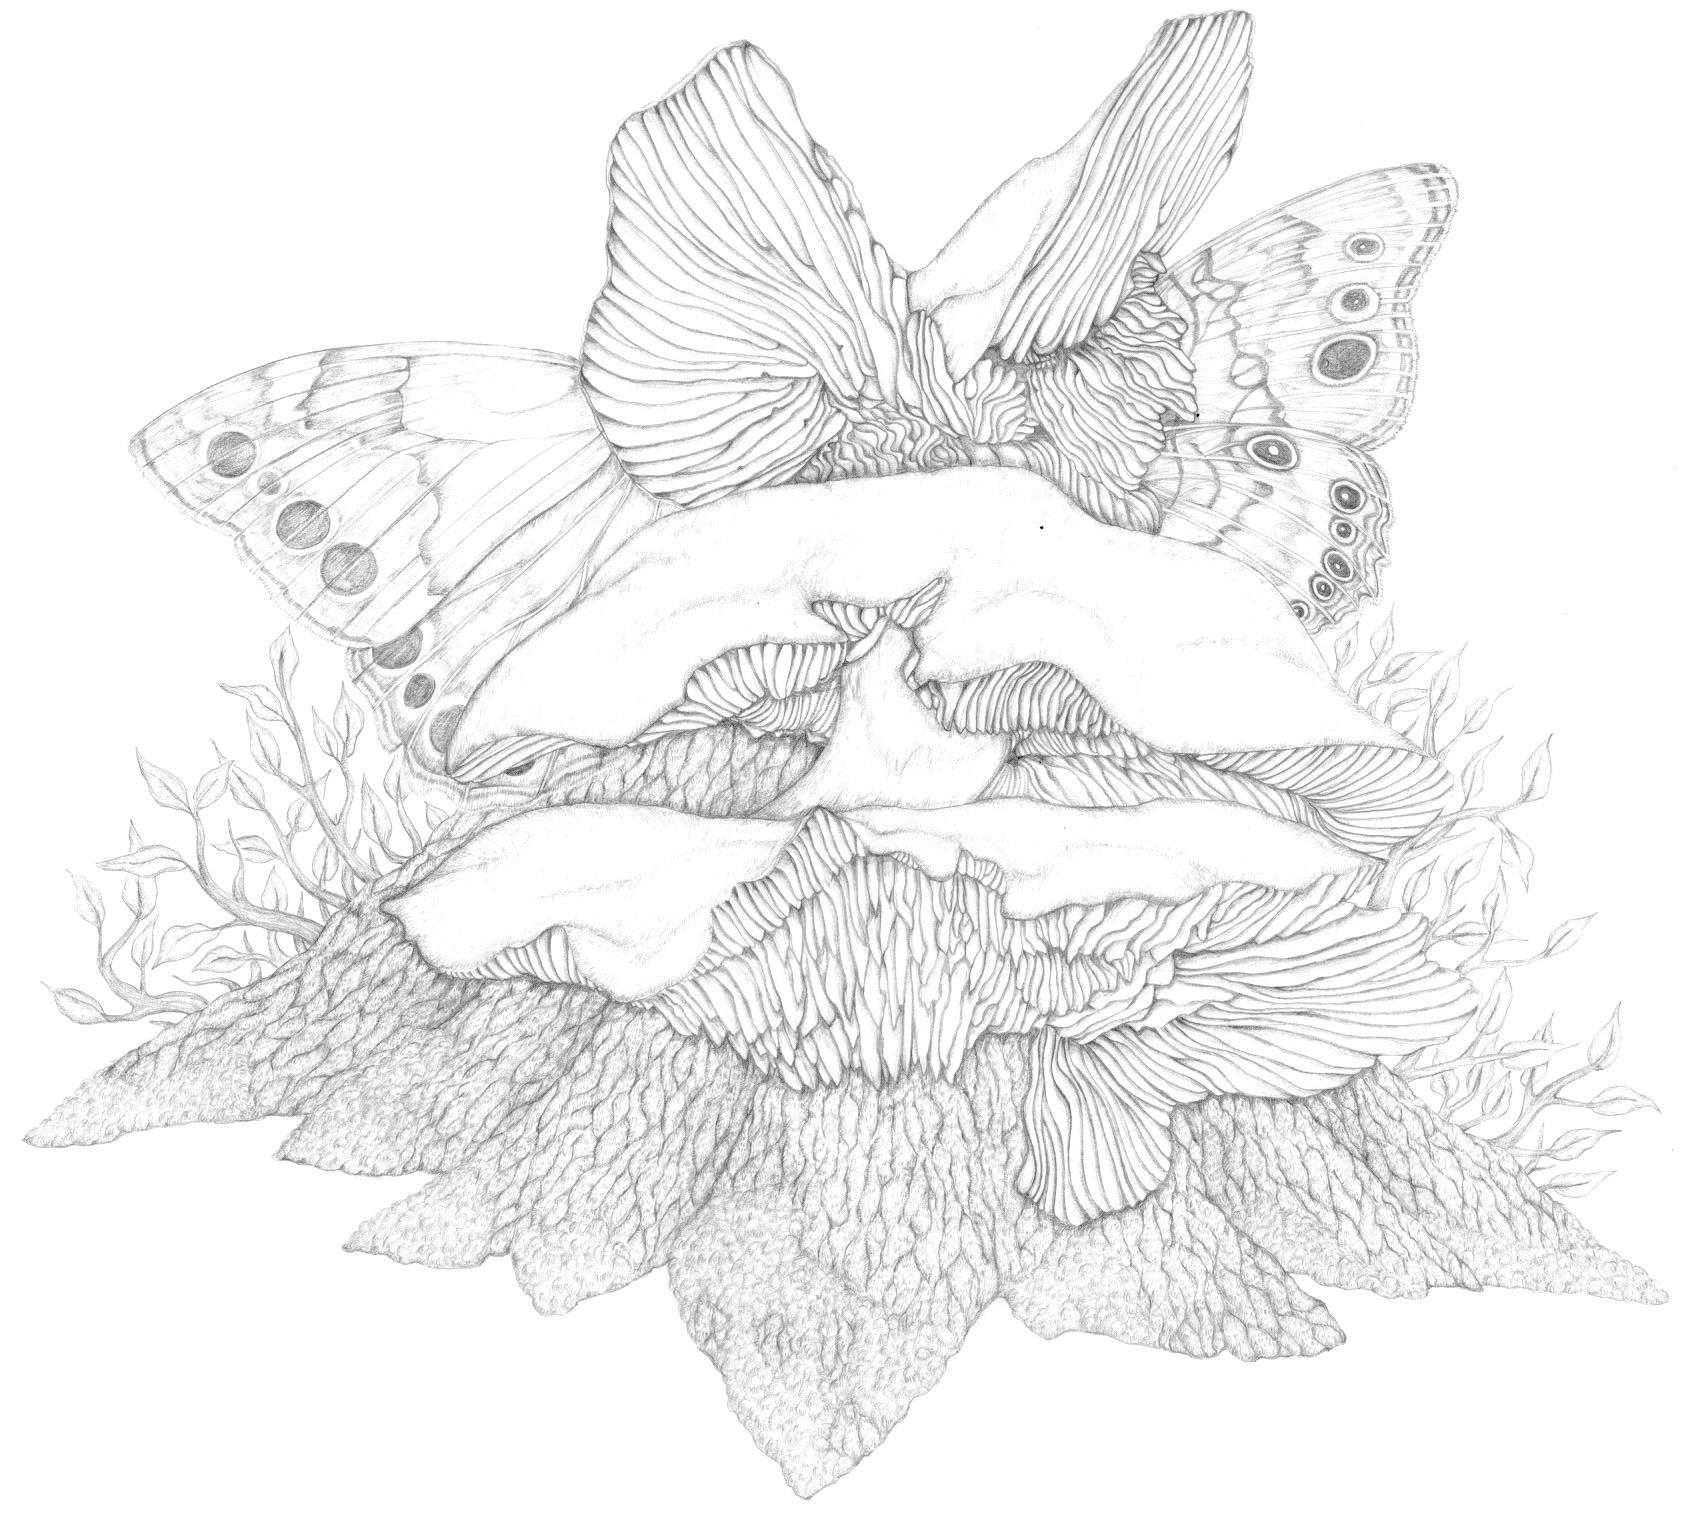 image 5.jpg